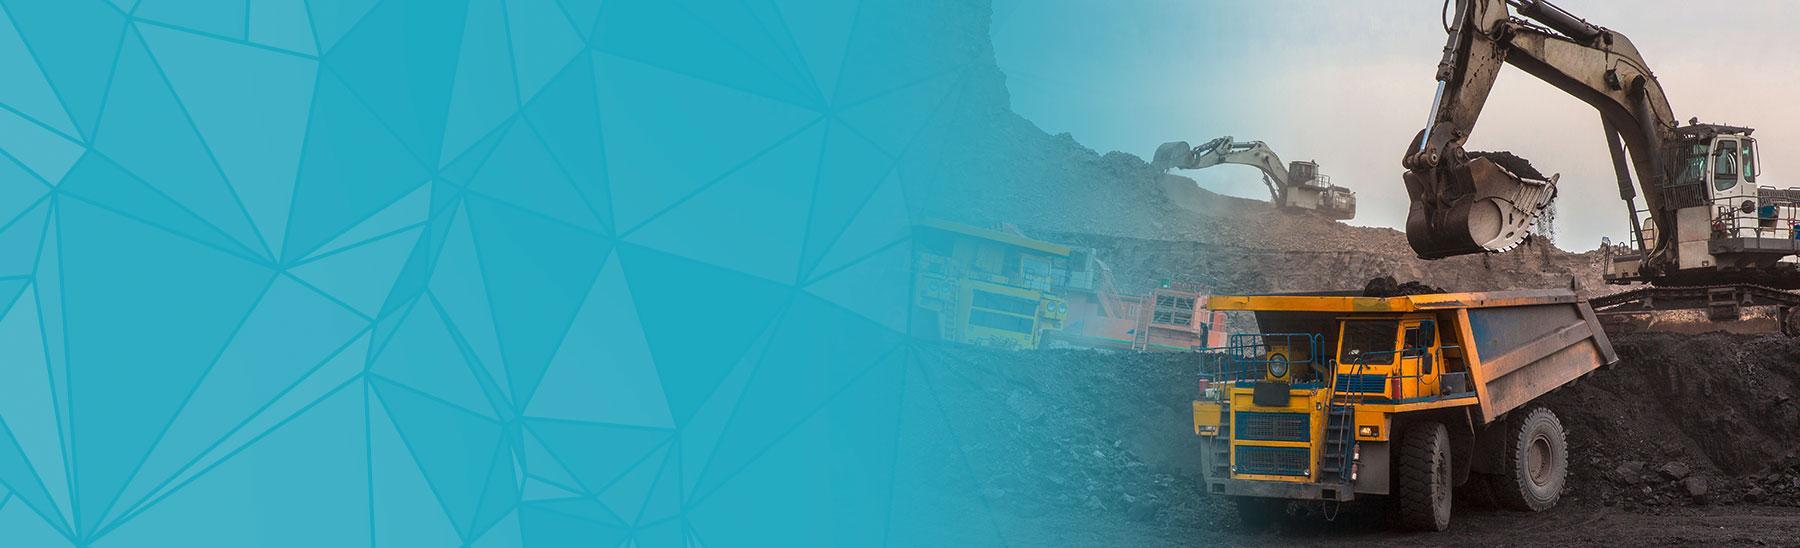 Key-Visual Ugol Rossii & Mining 2019